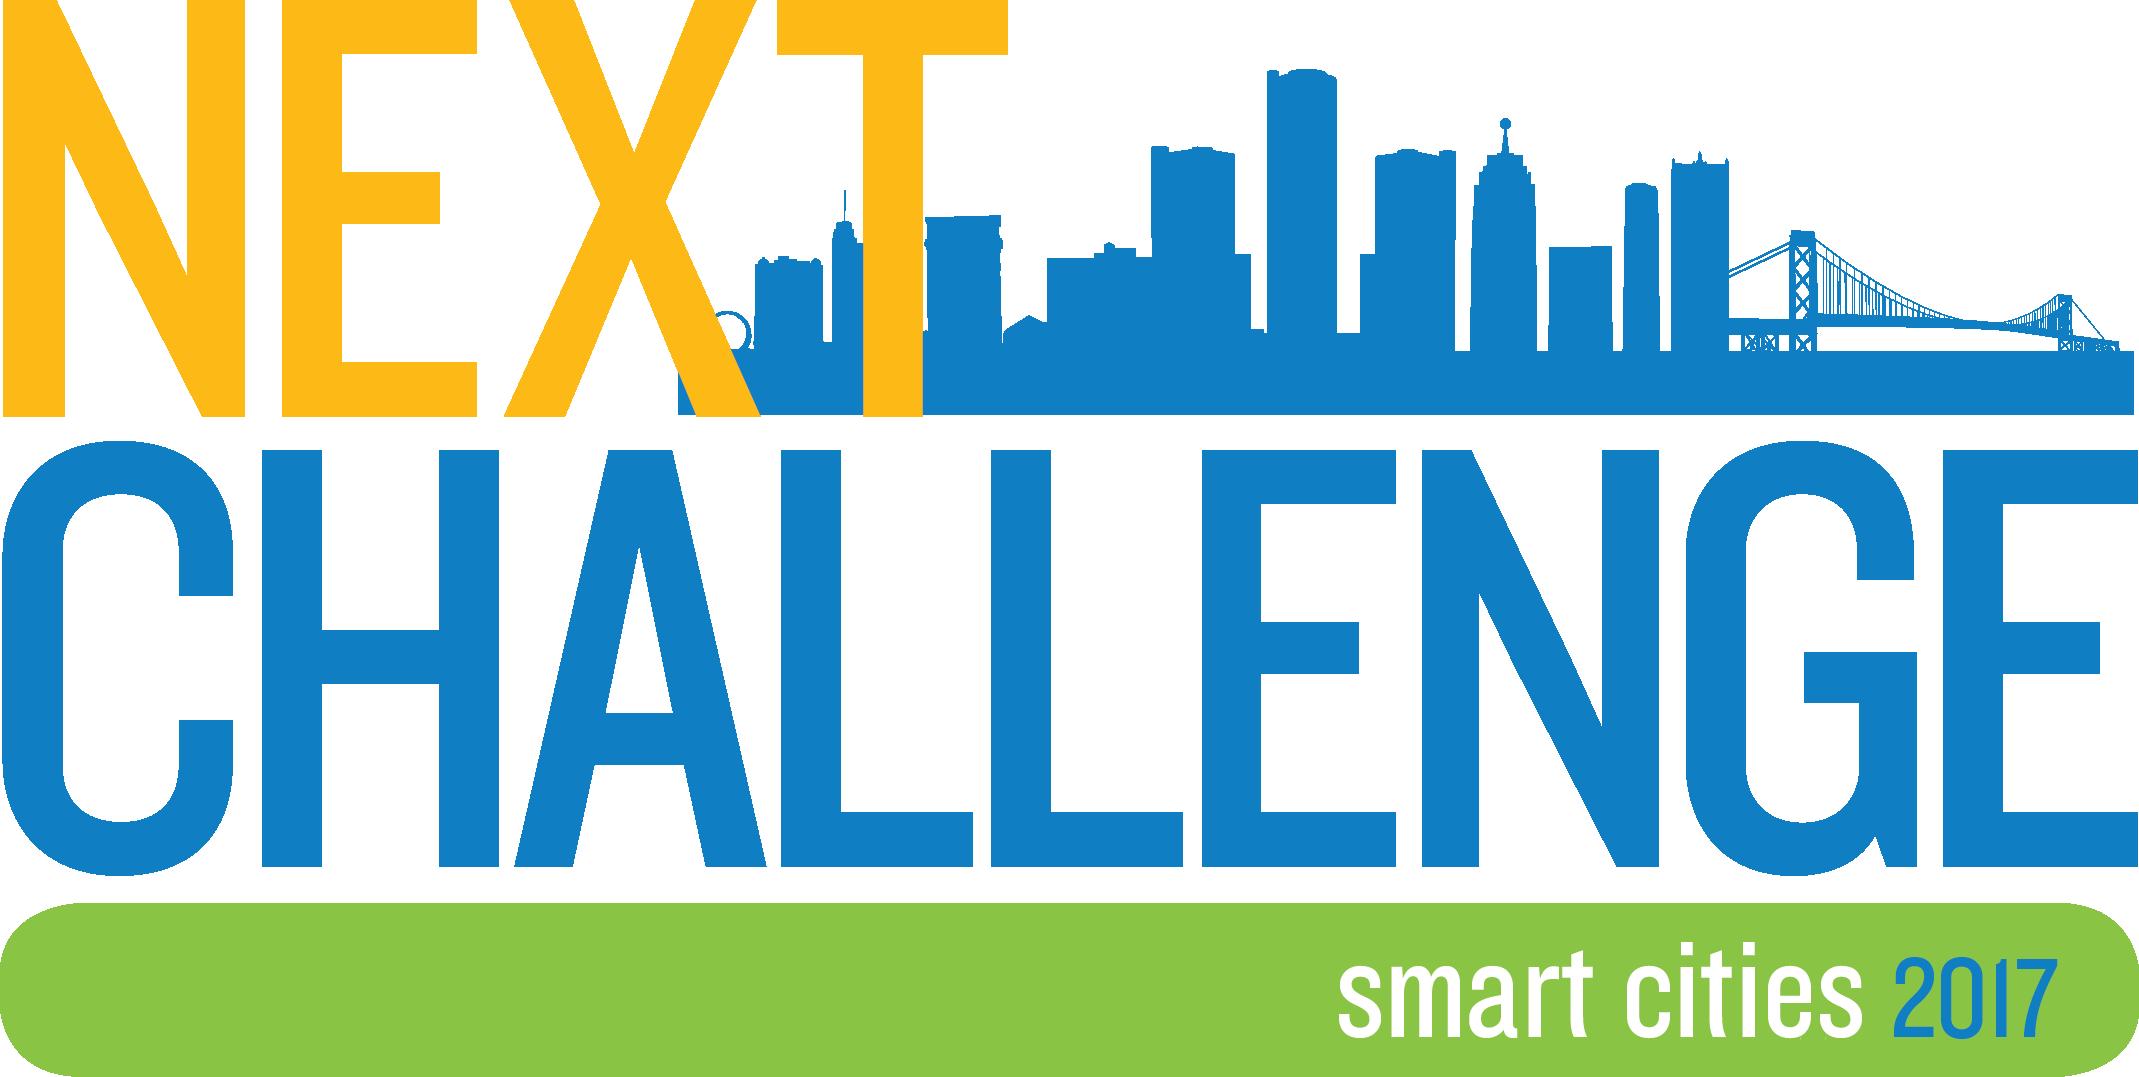 Nextchallenge nextenergy cities. City clipart smart city